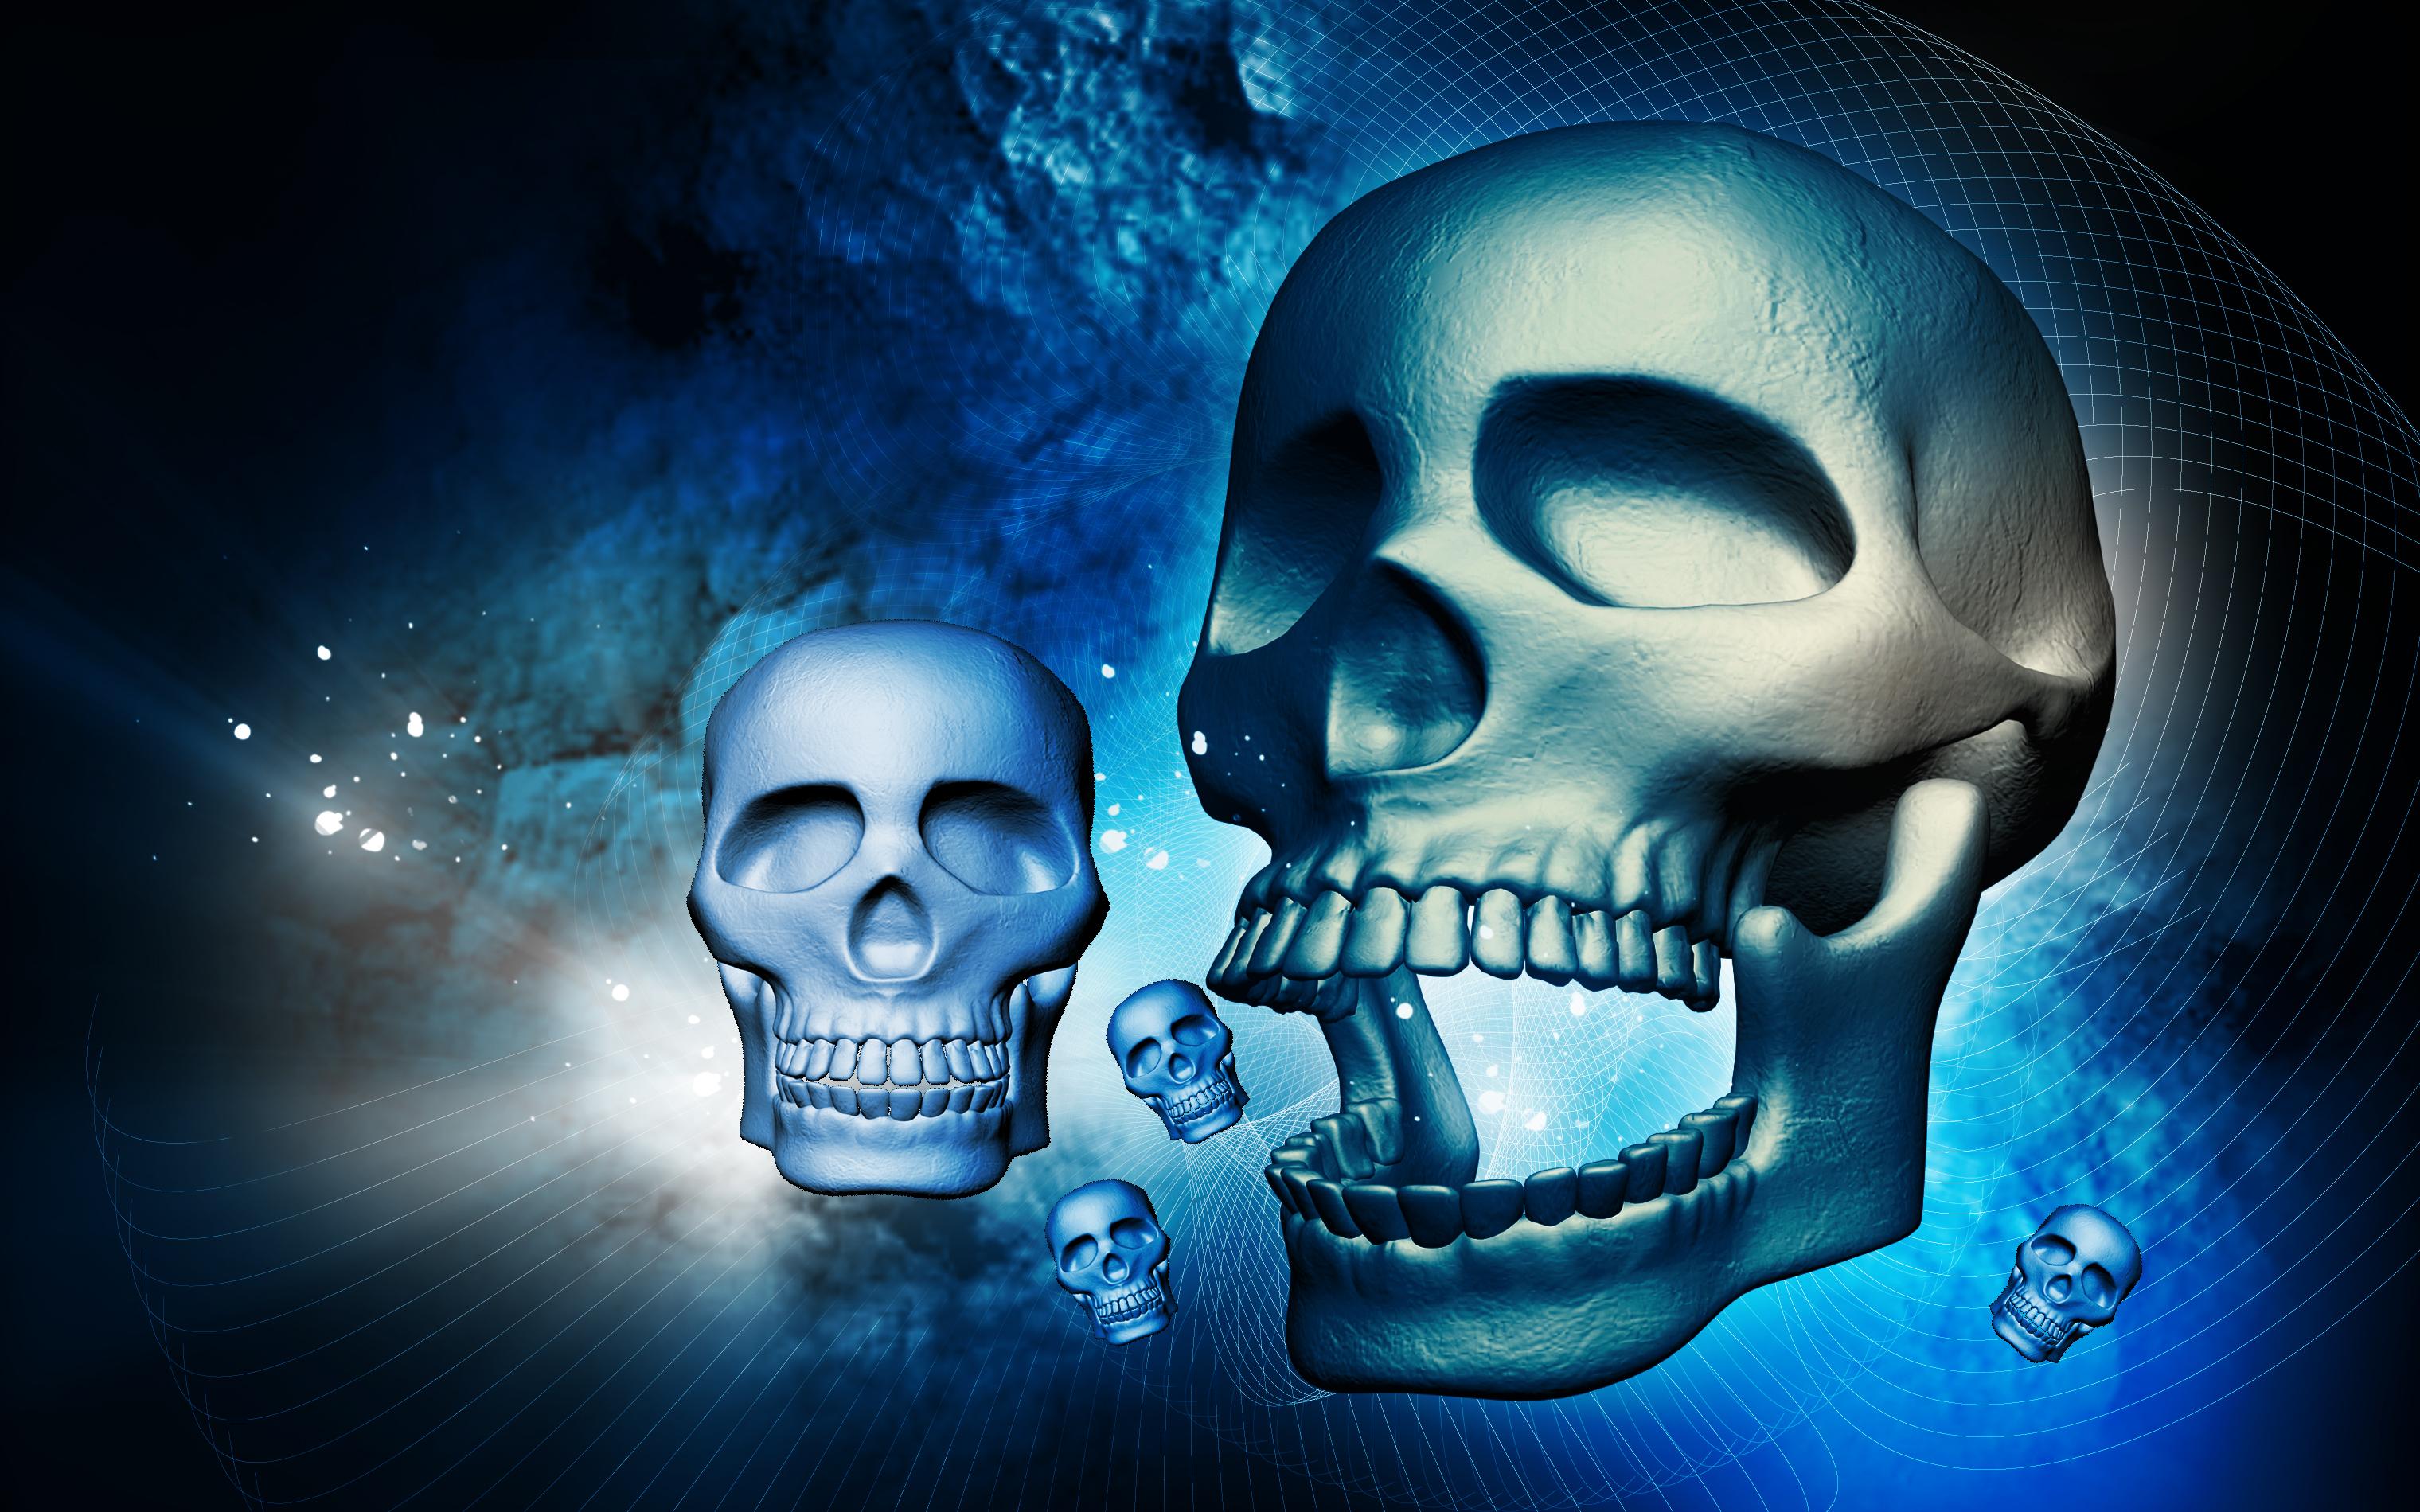 Skeletal photo